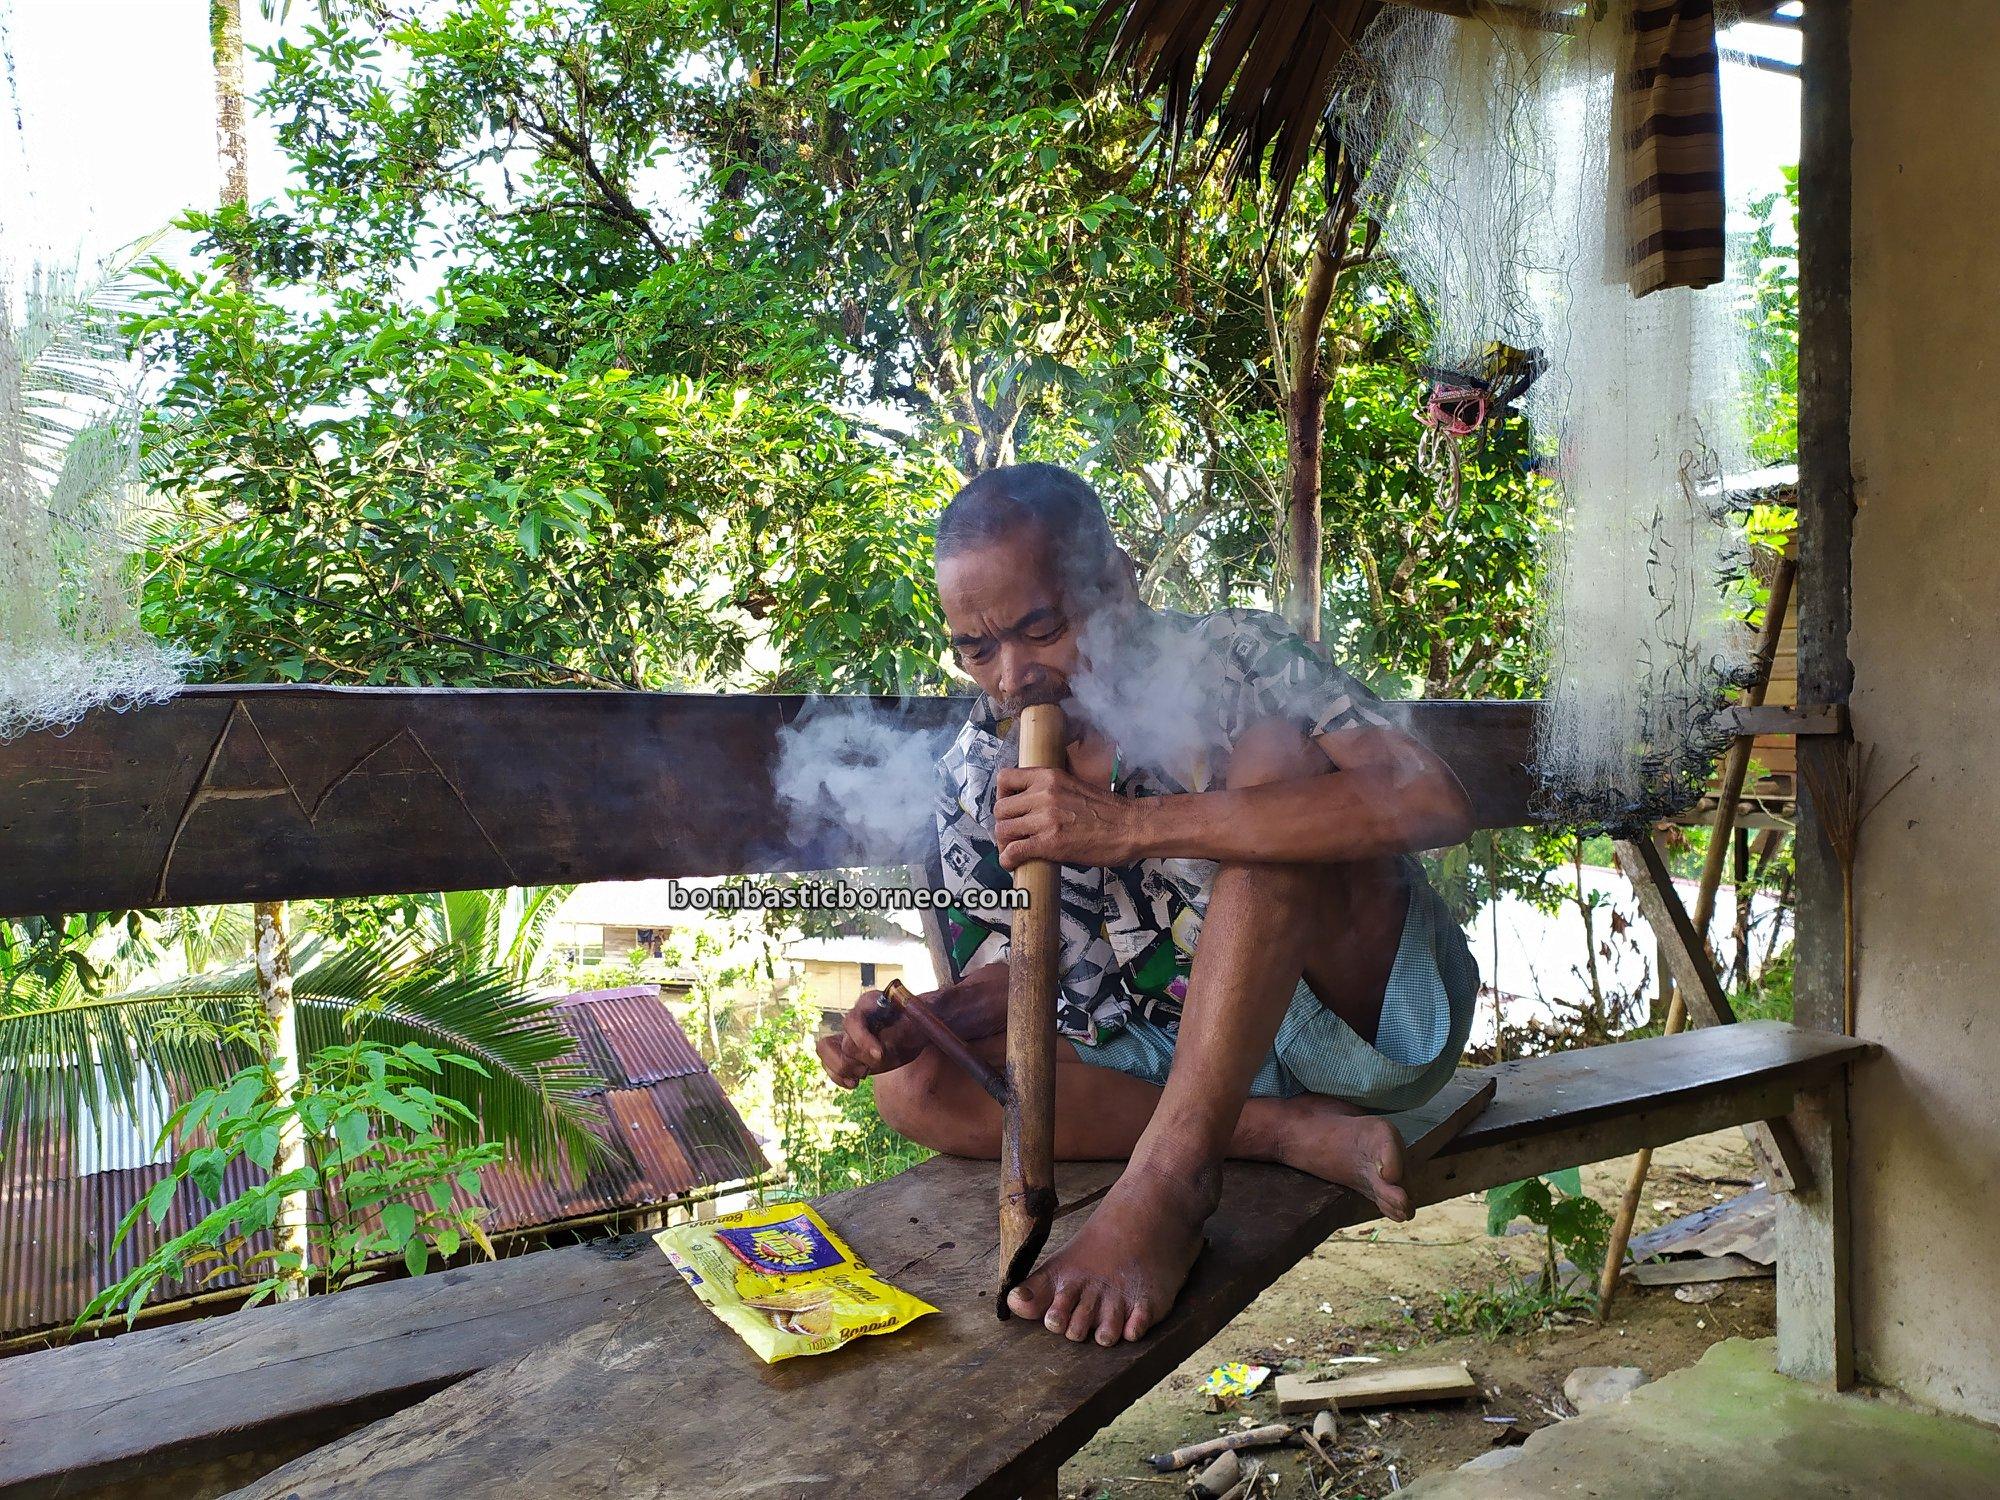 Dusun Medeng, traditional, indigenous, Bengkayang, Indonesia, West Kalimantan, native, tribal, highland, village, Tourism, Cross Border, 跨境婆罗洲达雅, 印尼西加里曼丹, 孟加映宋宫部落,